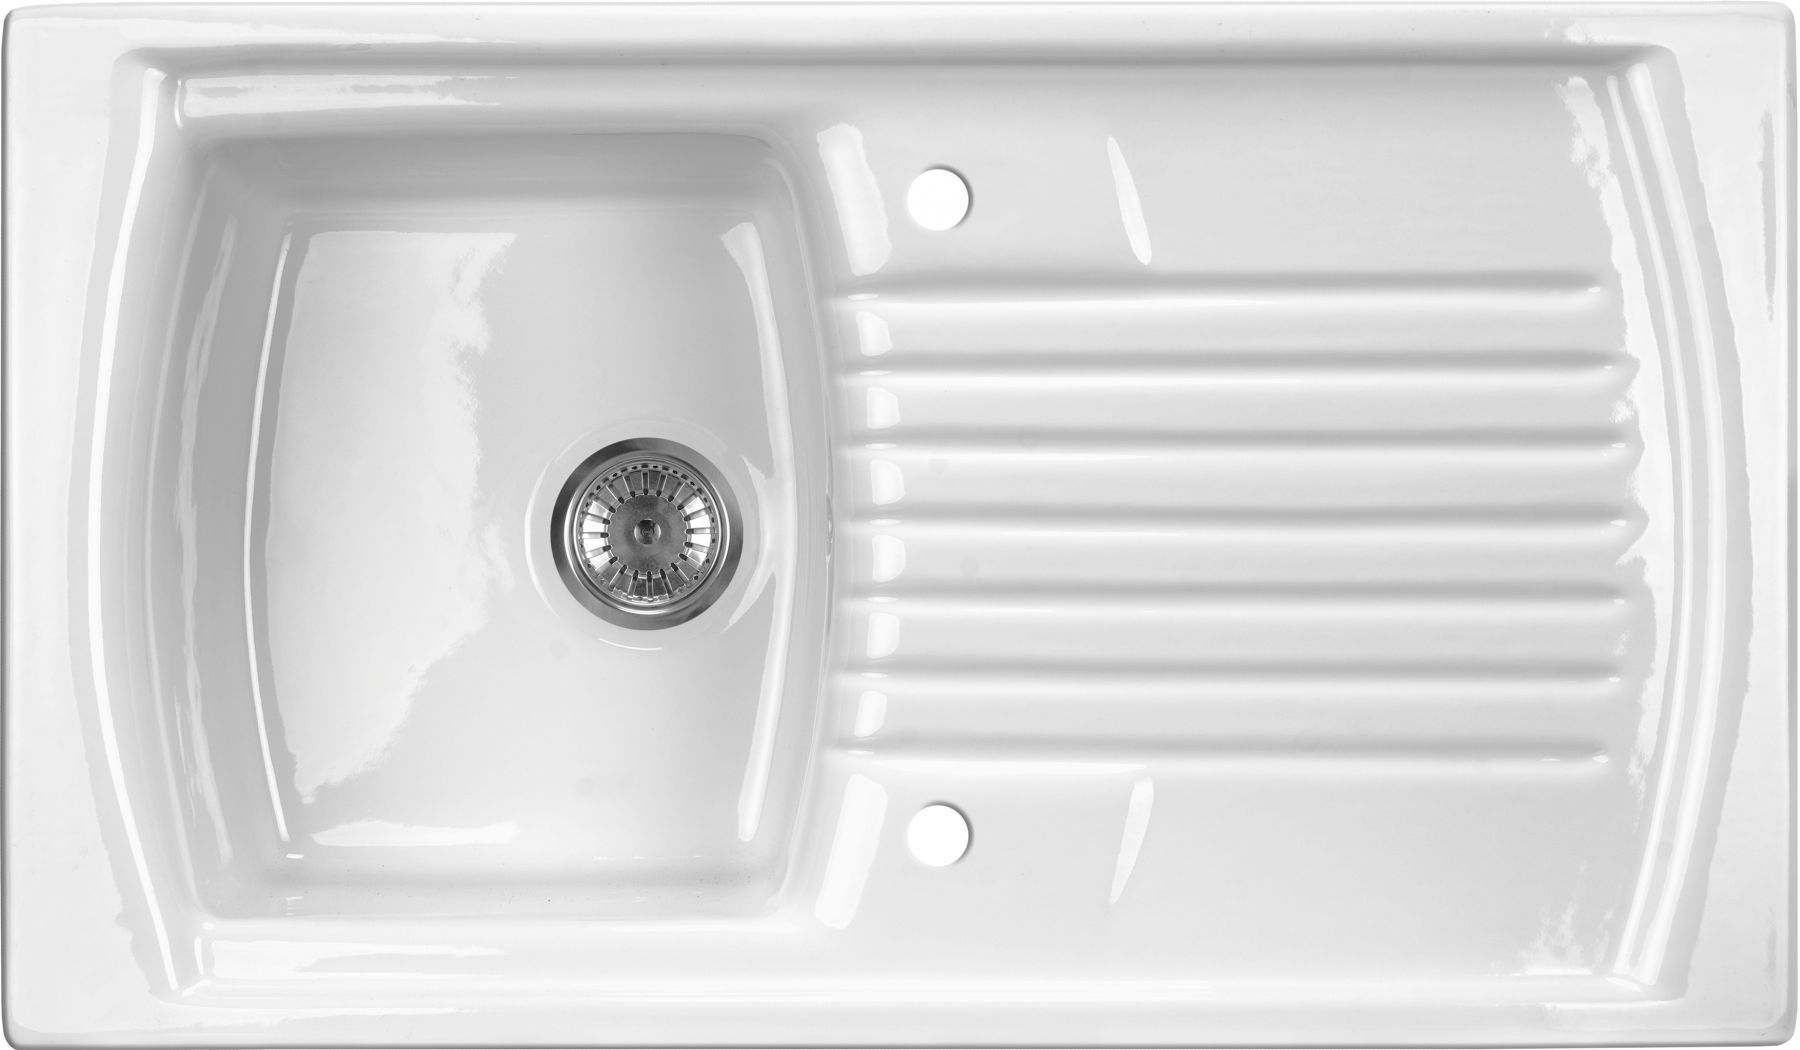 porcelain kitchen sink | ceramic kitchen sink | porcelain farmhouse ...